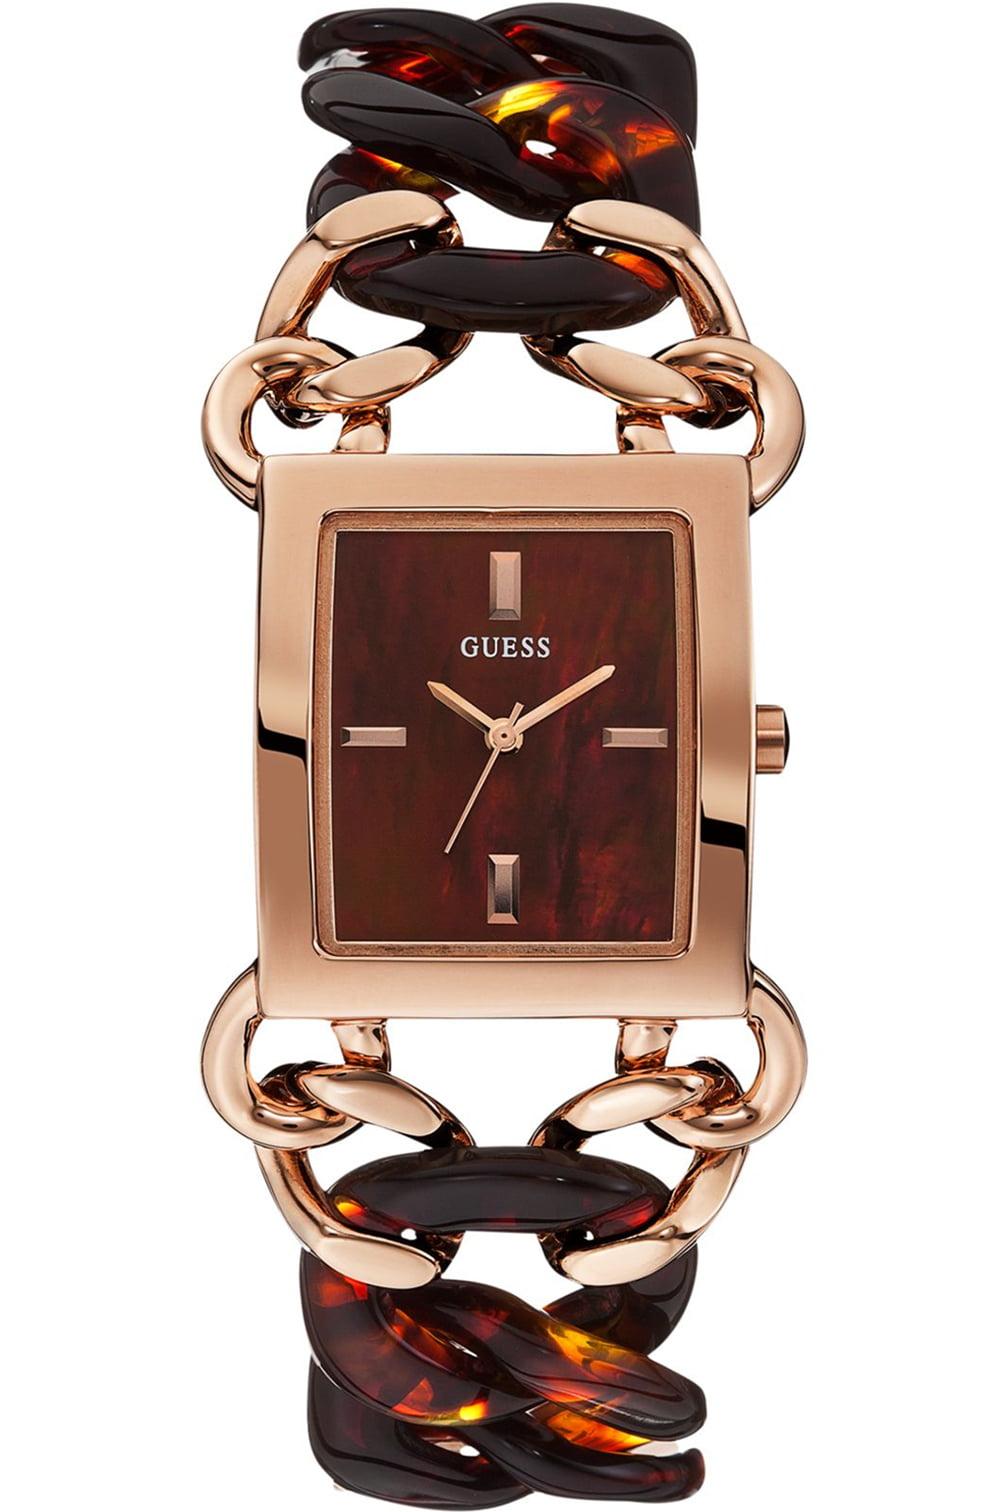 GUESS STEEL W0467L1,Women's Dress Elegant,Stainless Steel Case & Bracelet,Rose Gold Tone,Brown Dial,WR